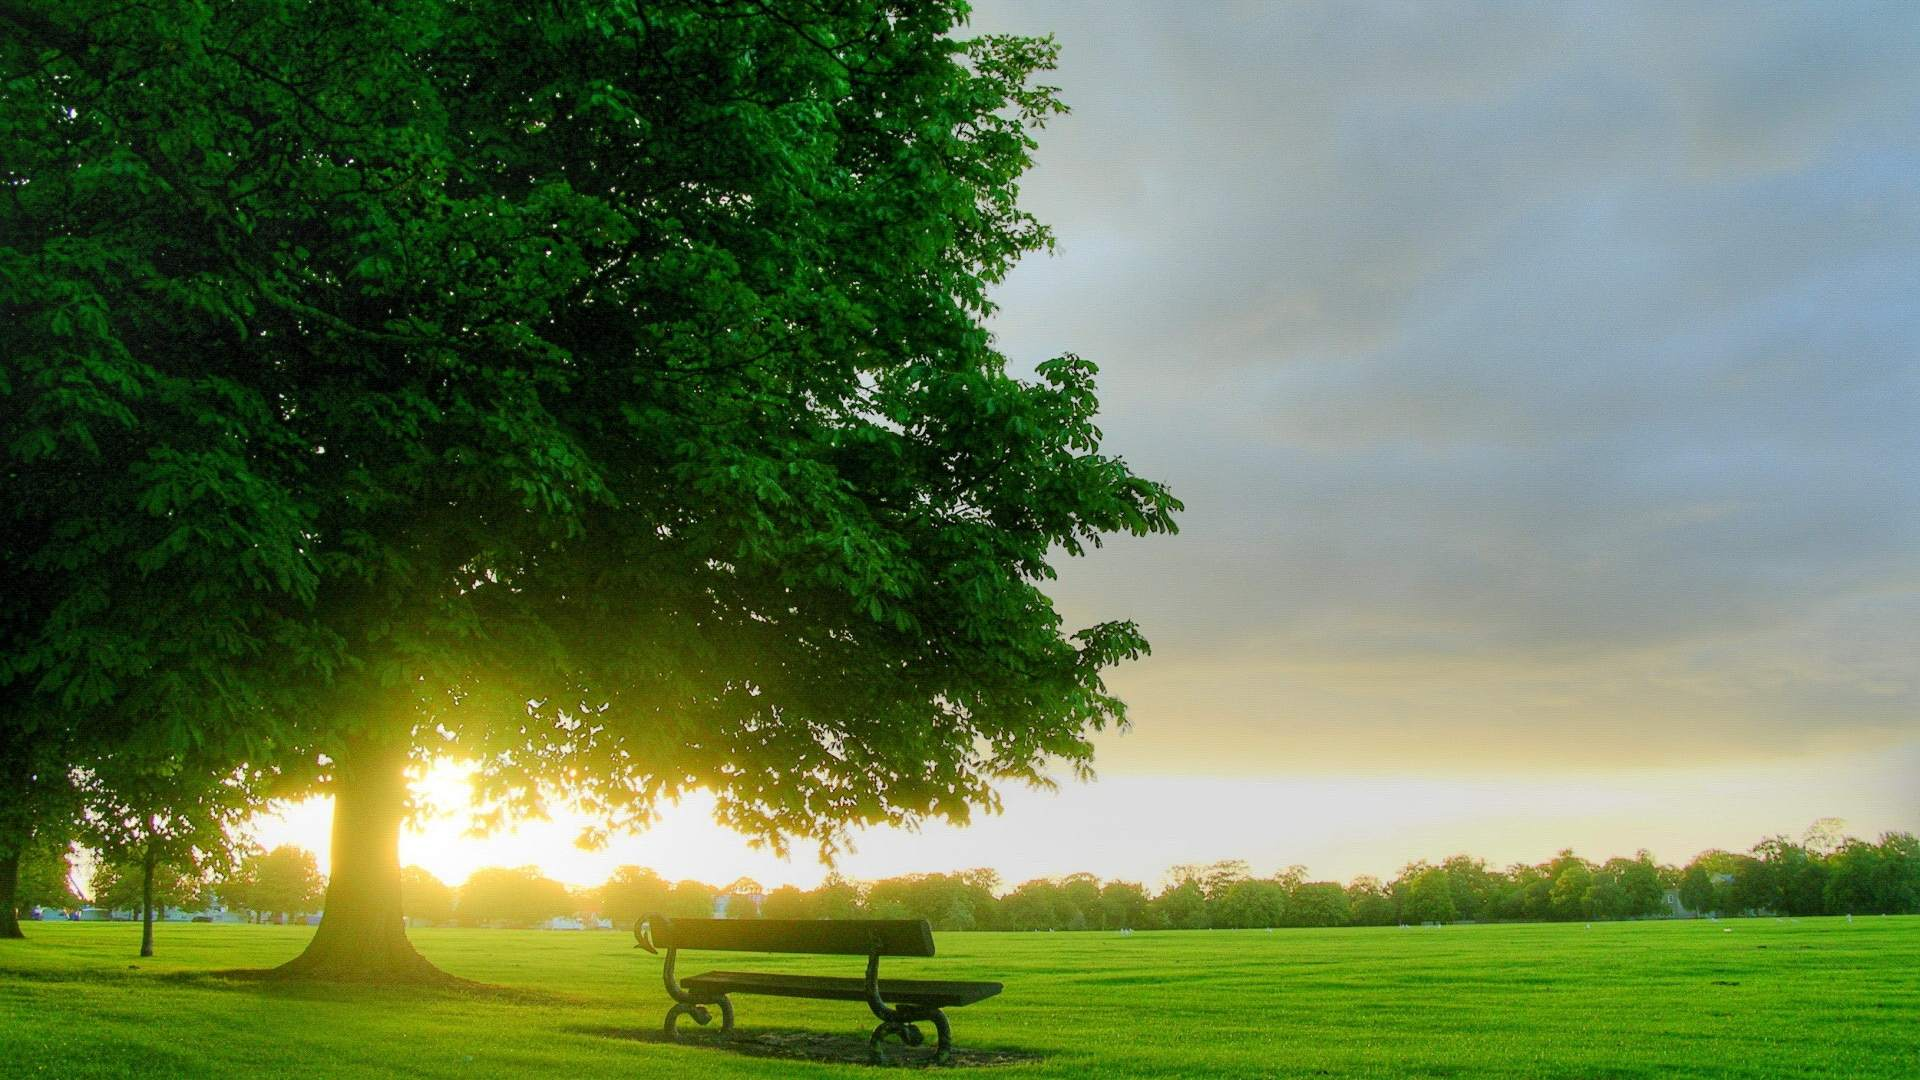 tree photo hd